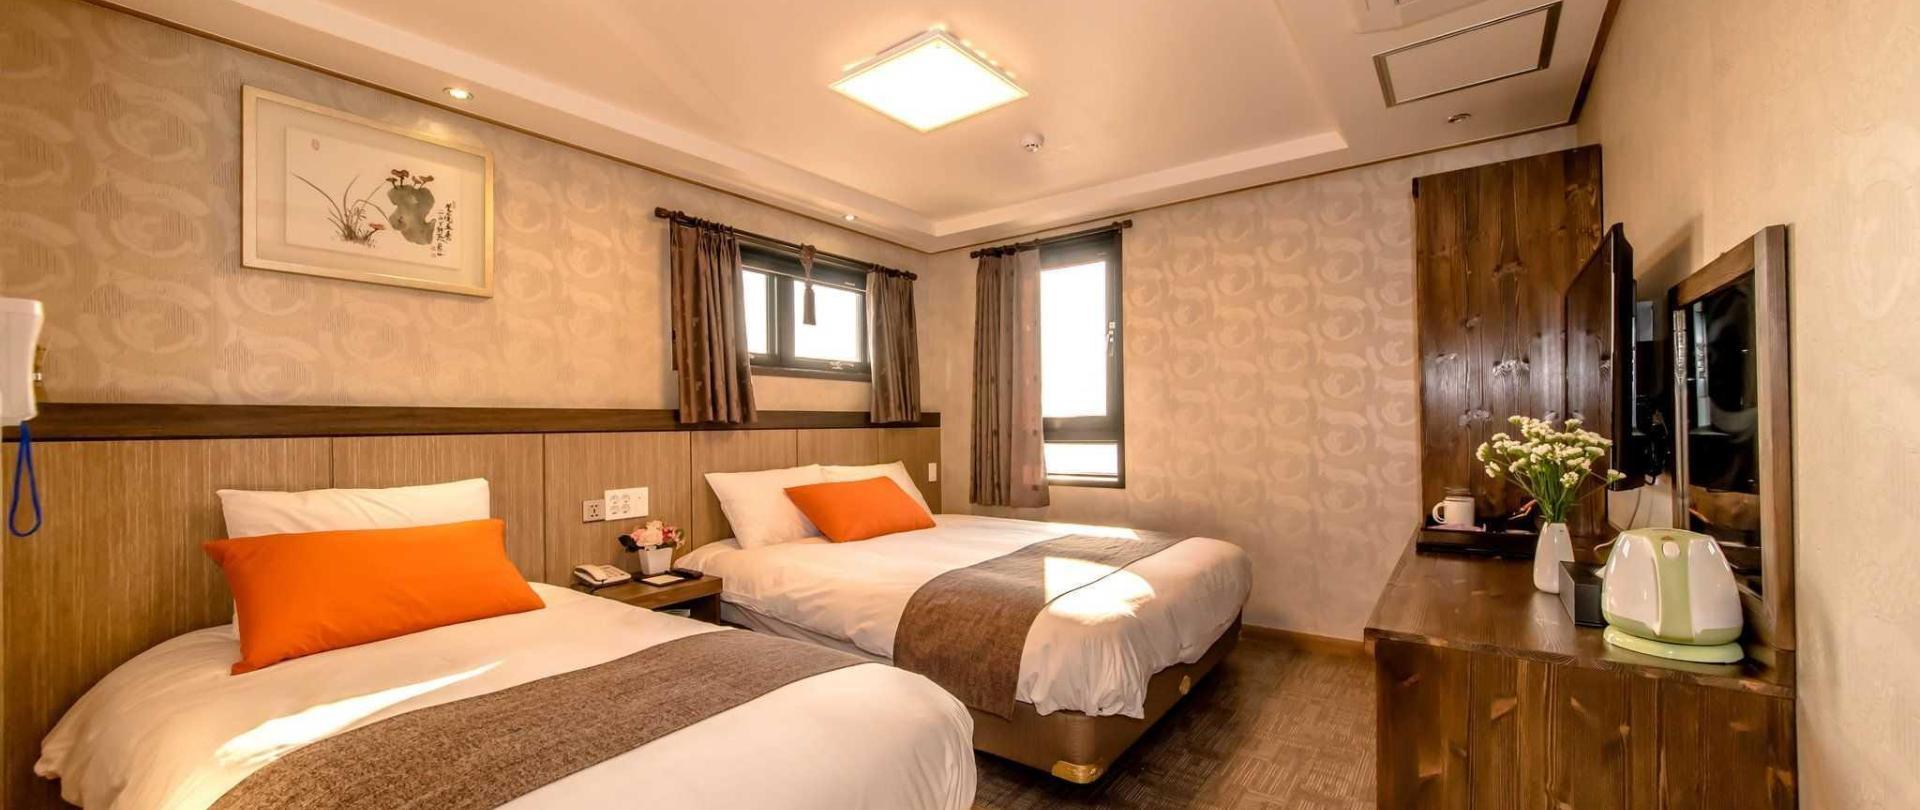 j-dream-hotel-06.jpg